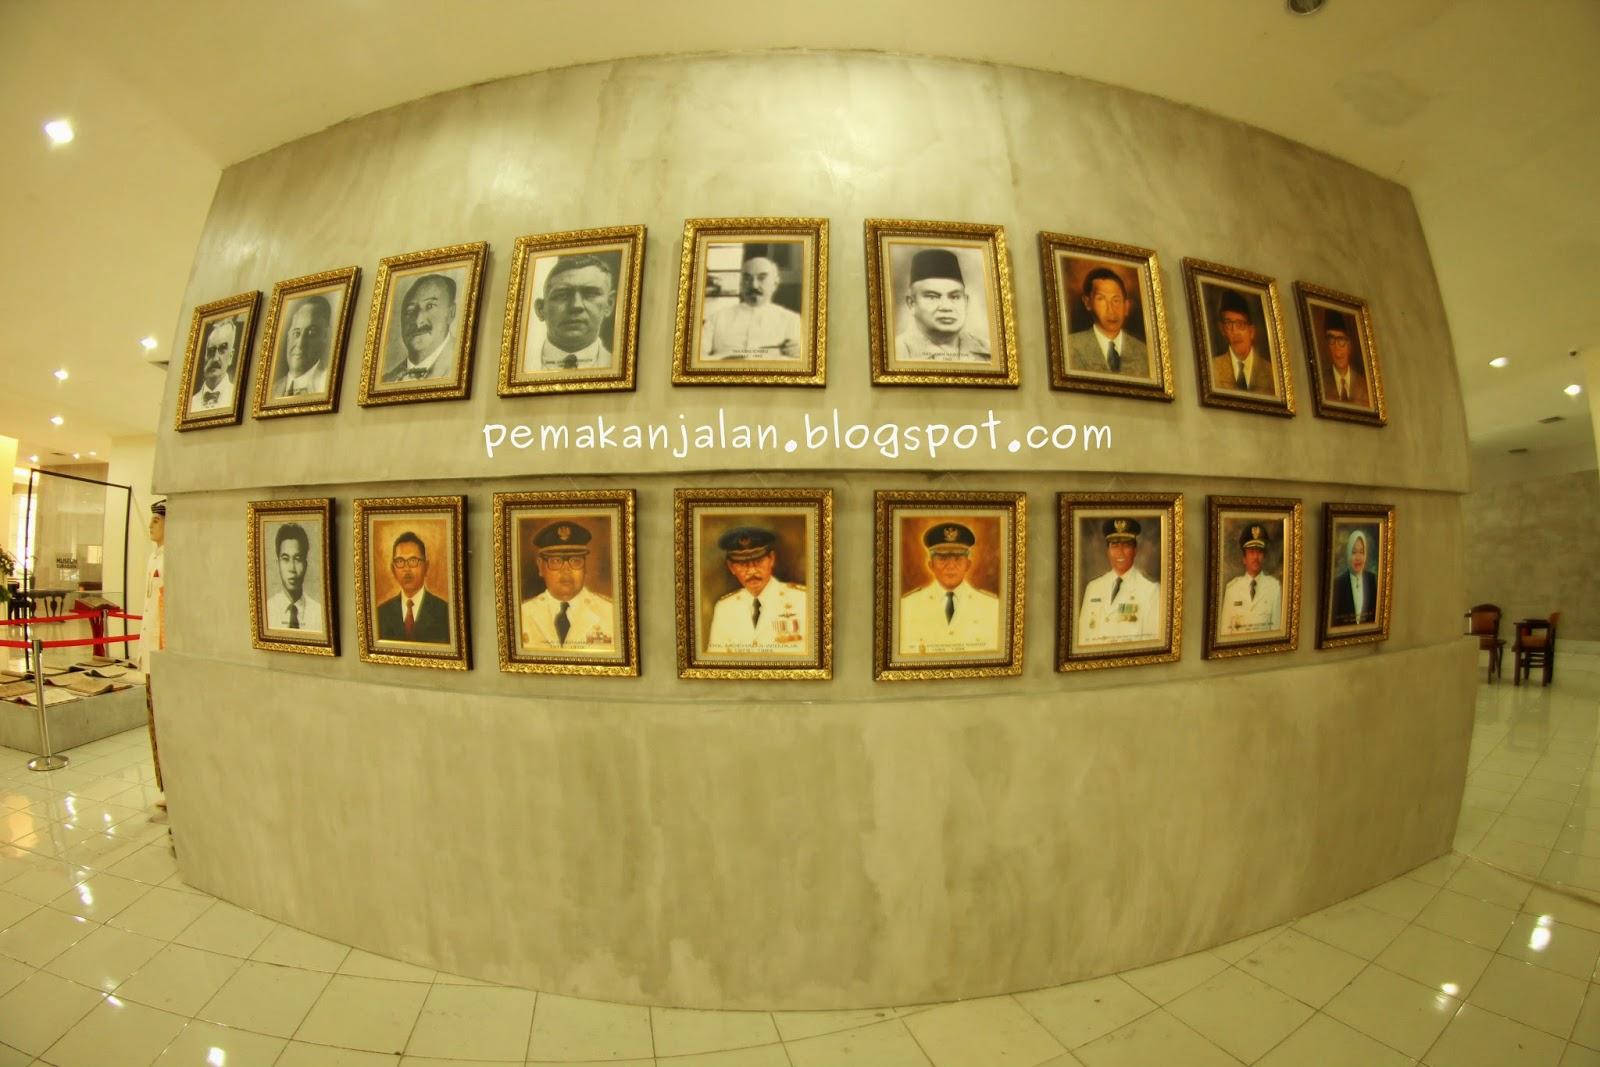 Alternatif Wisata Museum Surabaya Pemakan Jalan Deretan Foto Wali Kota